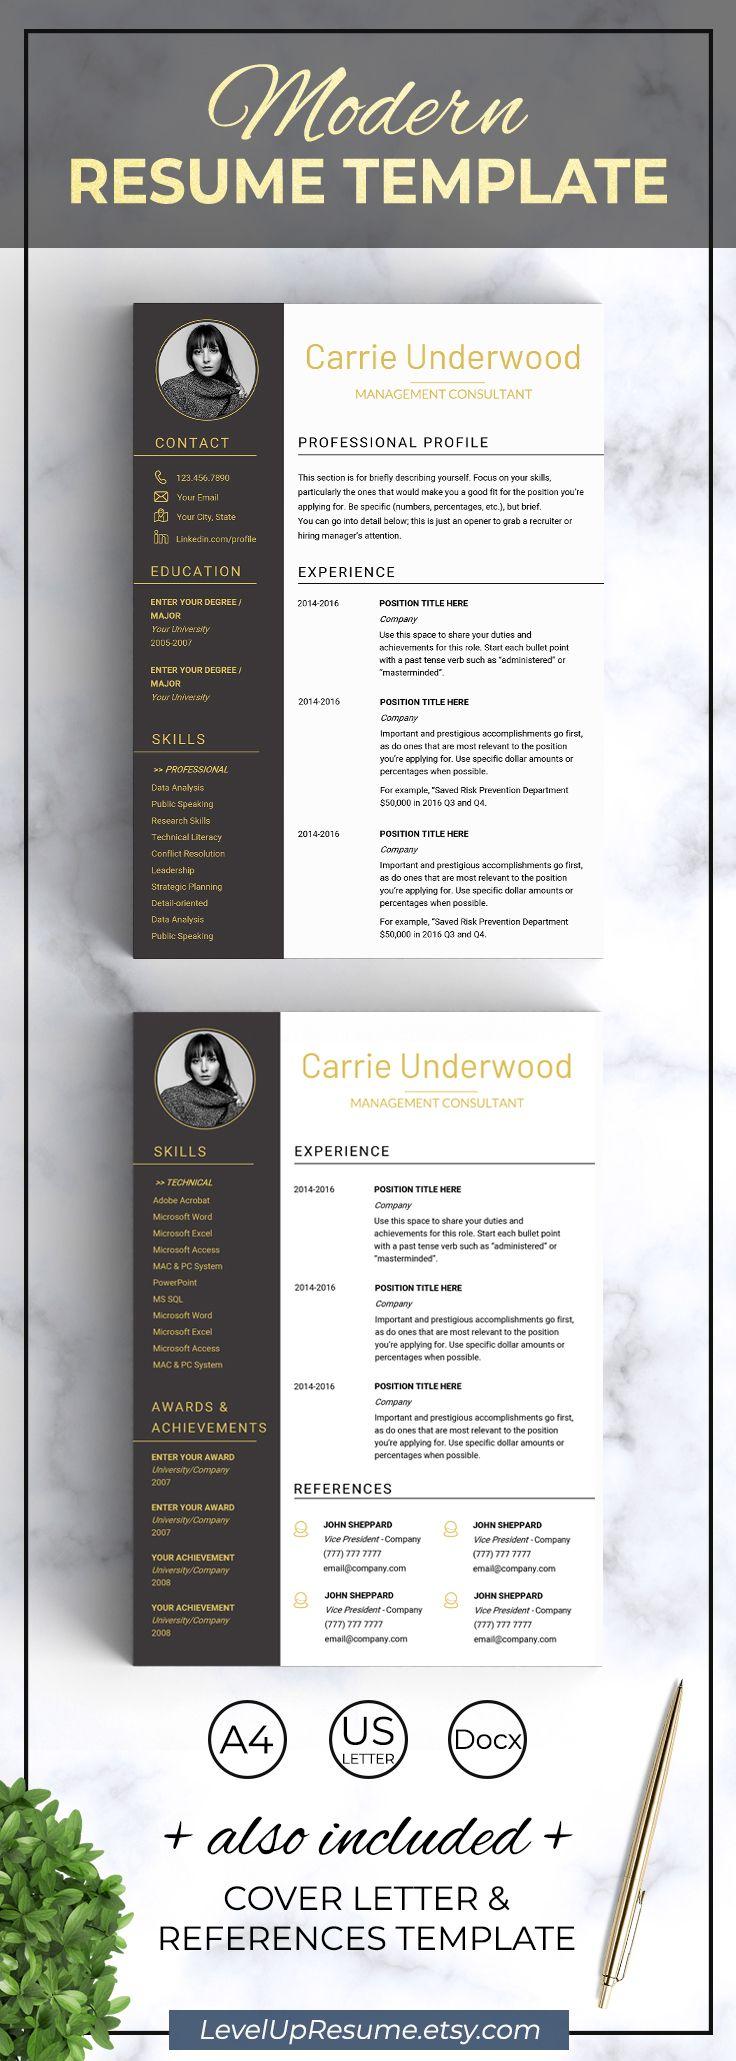 Resume Template Modern Resume With Photo Design Resume Templates Cv